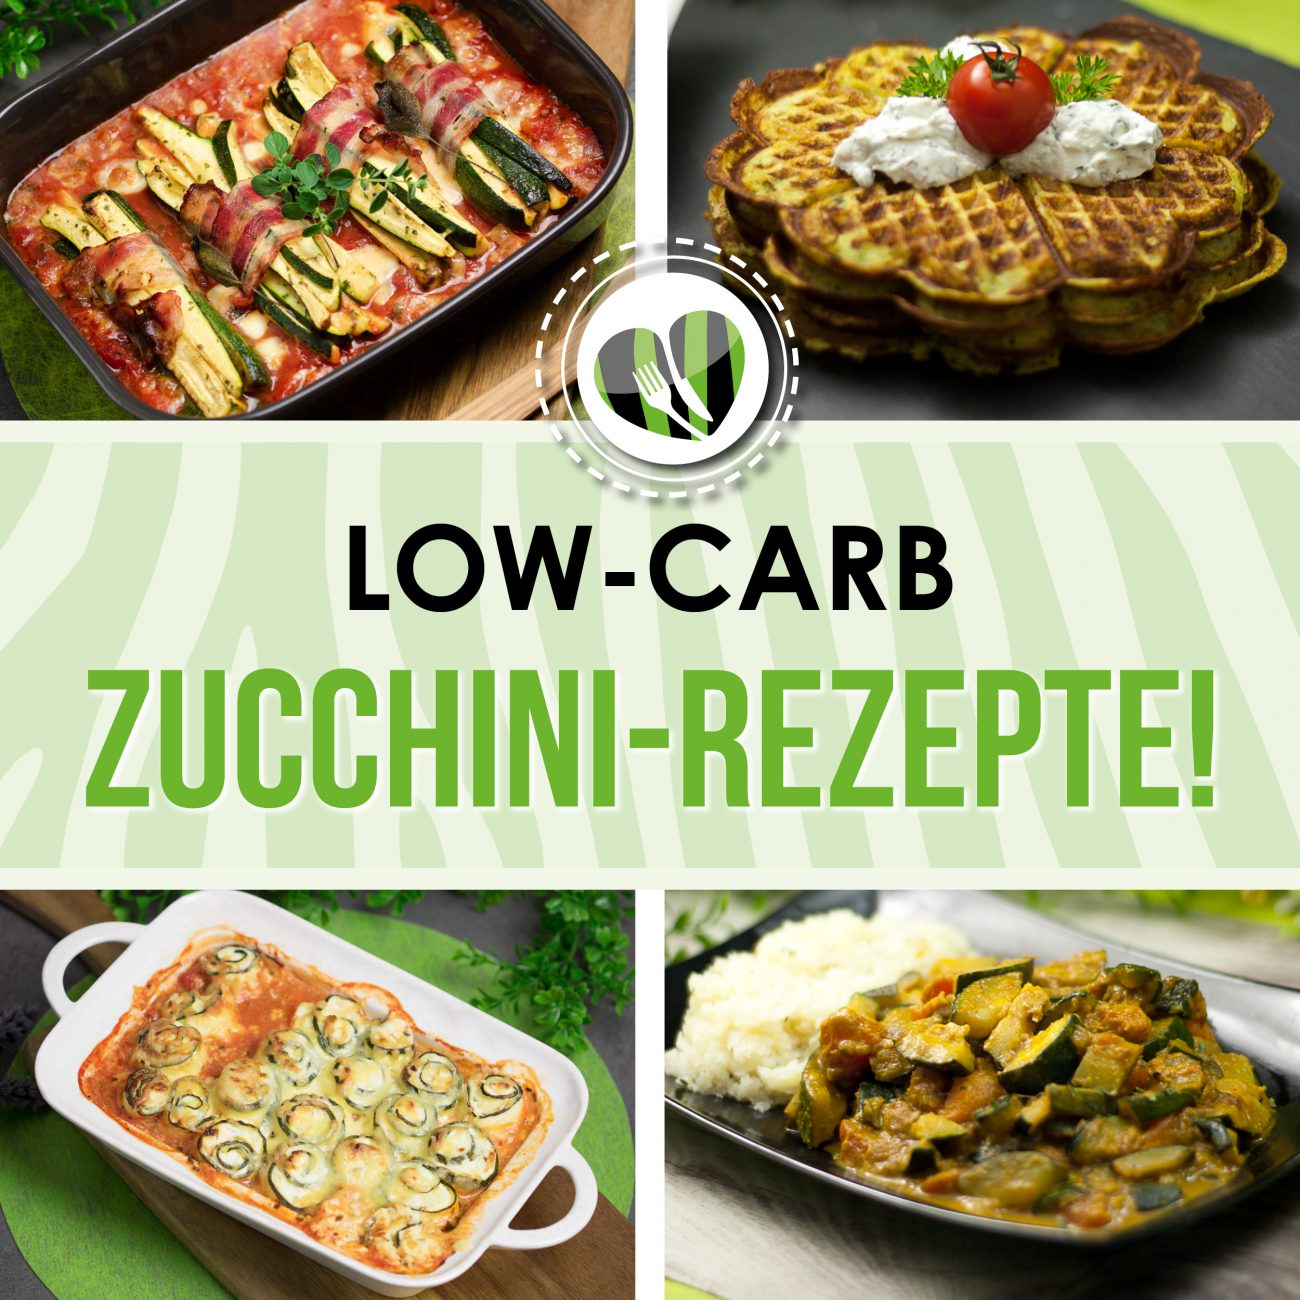 Die Low Carb Zucchini-Rezepte sind lecker und Low Carb.